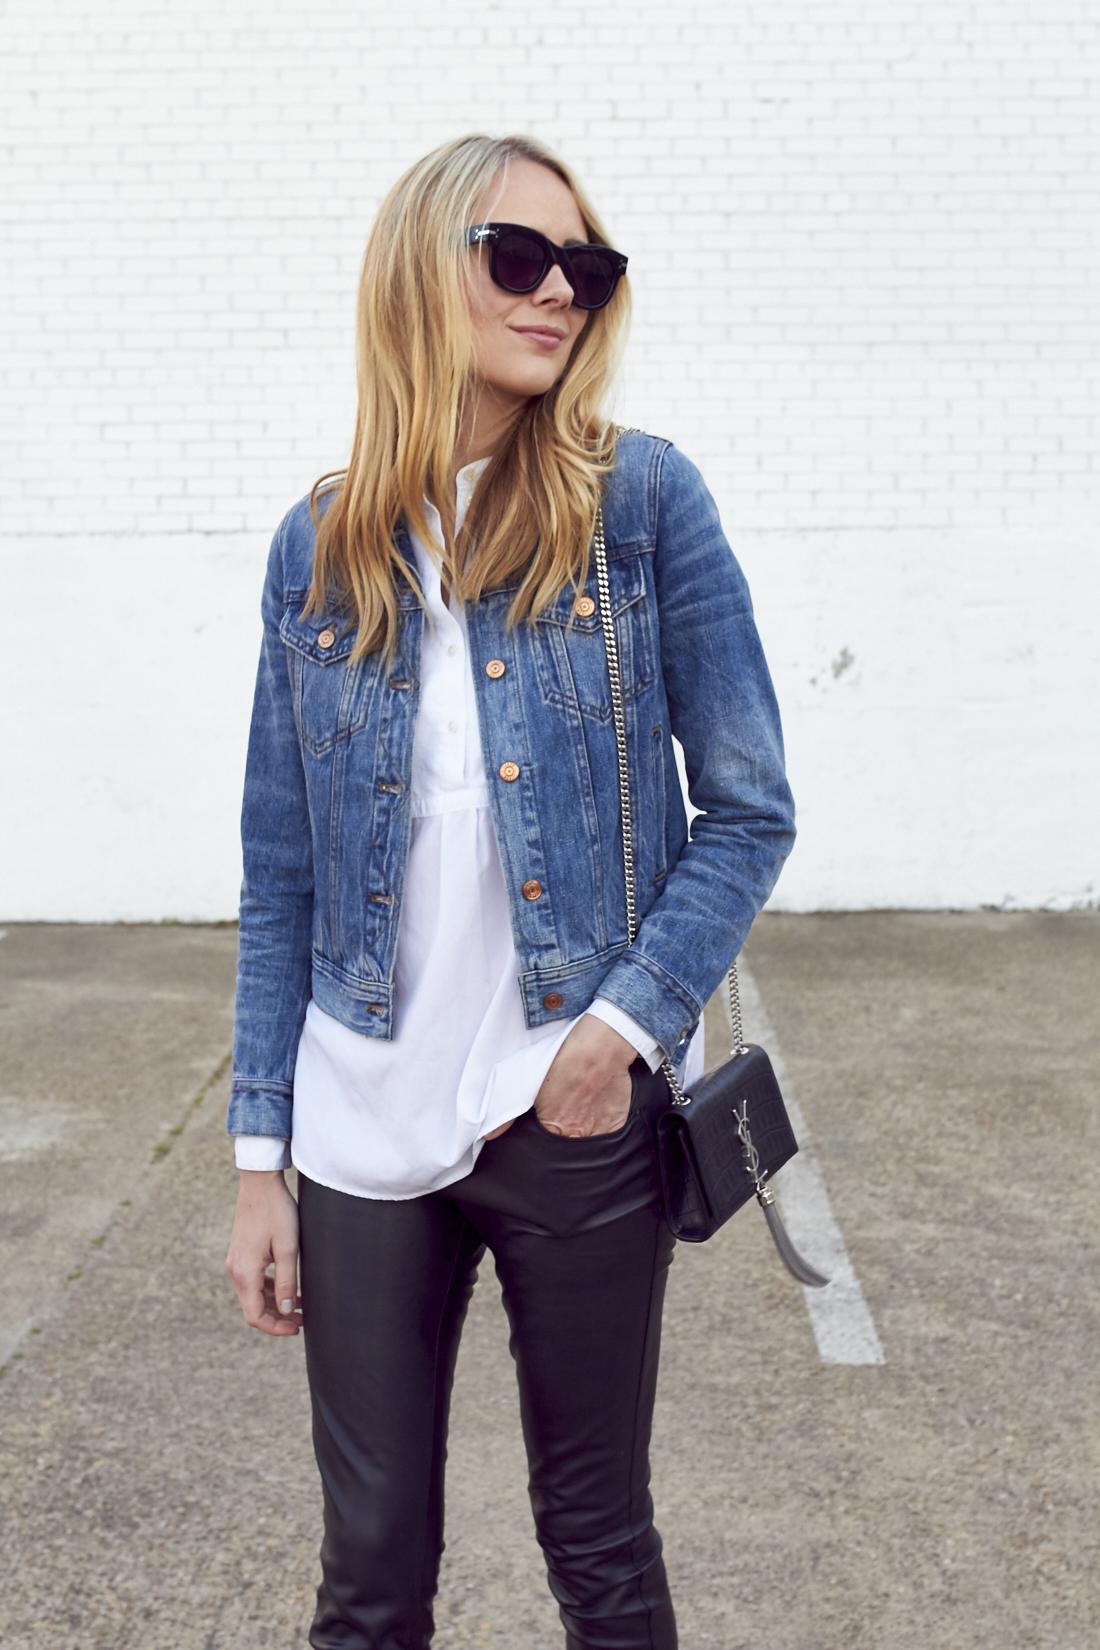 fashion-jackson-celine-sunglasses-jcrew-denim-jacket